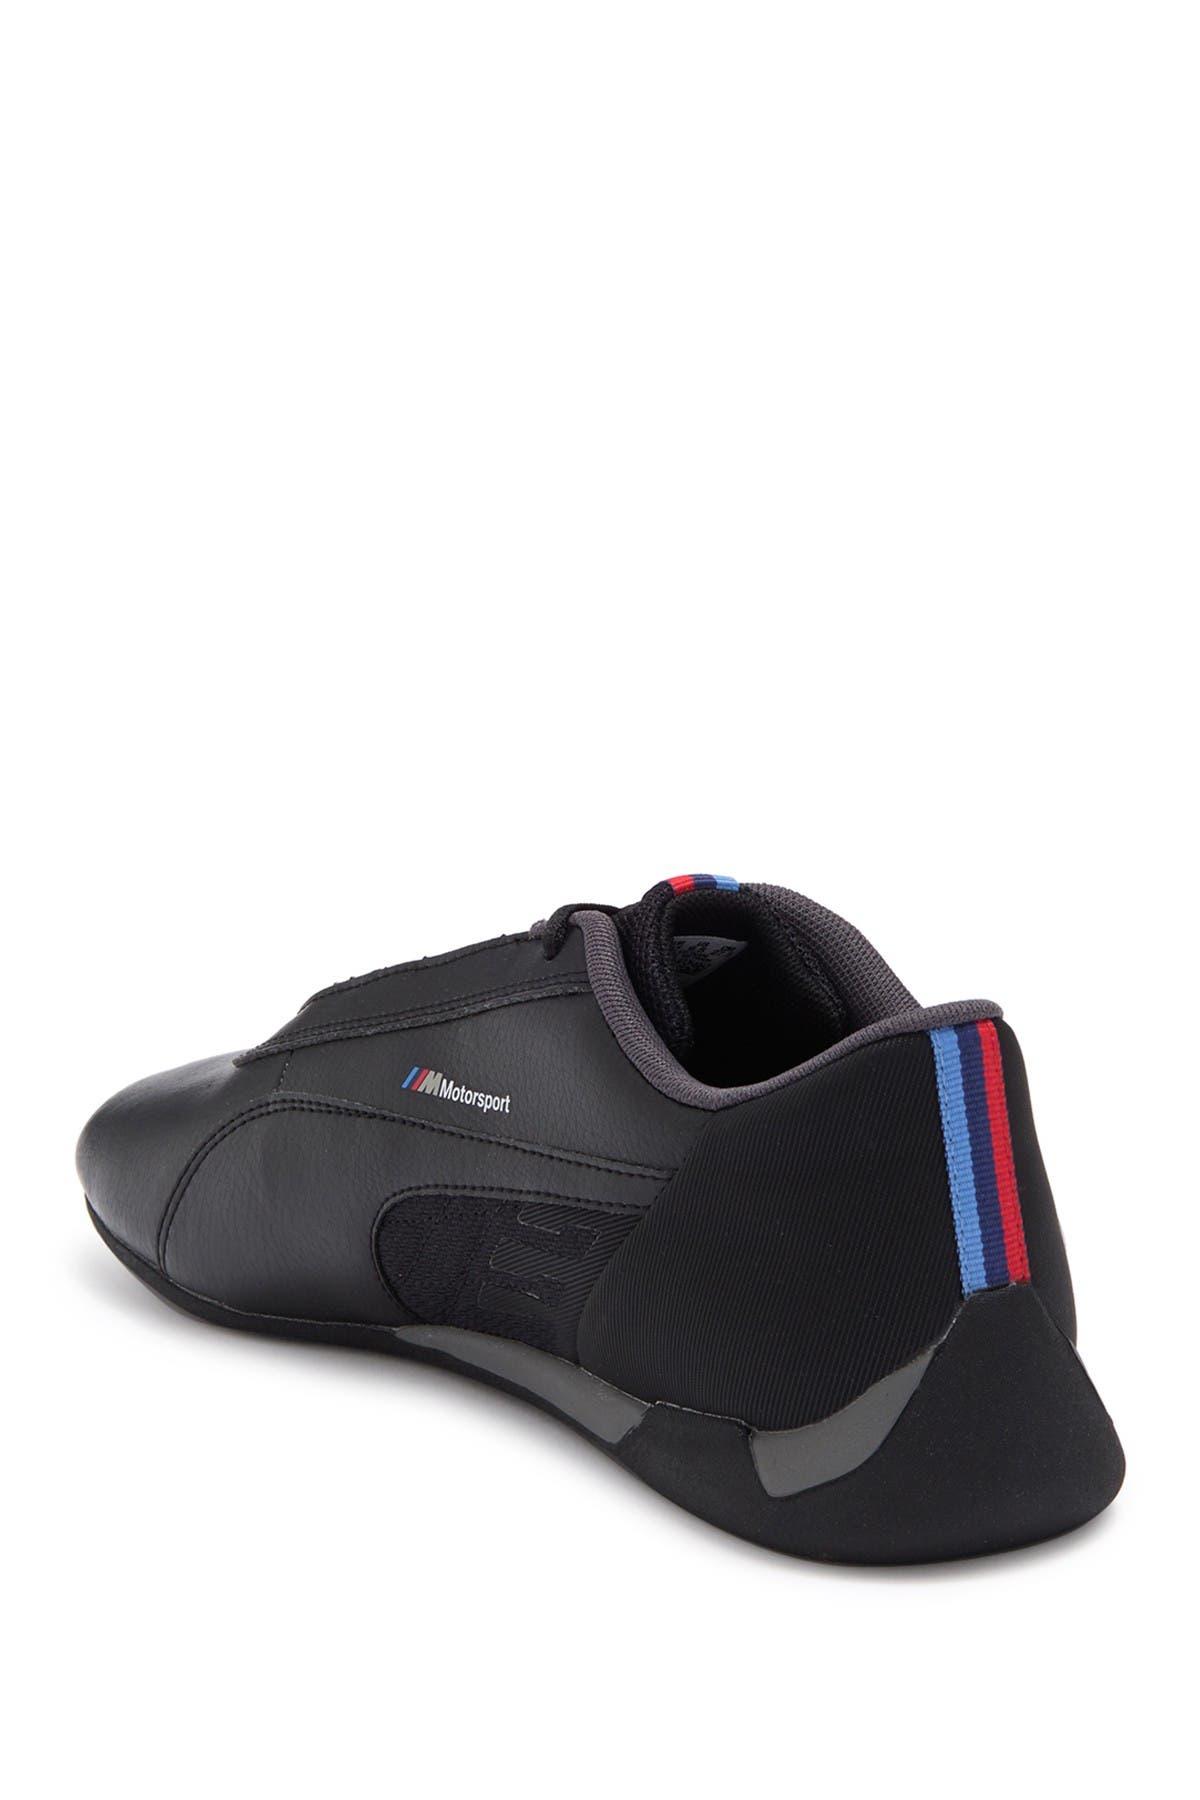 Image of PUMA BMW MMS R-Cat Sneaker